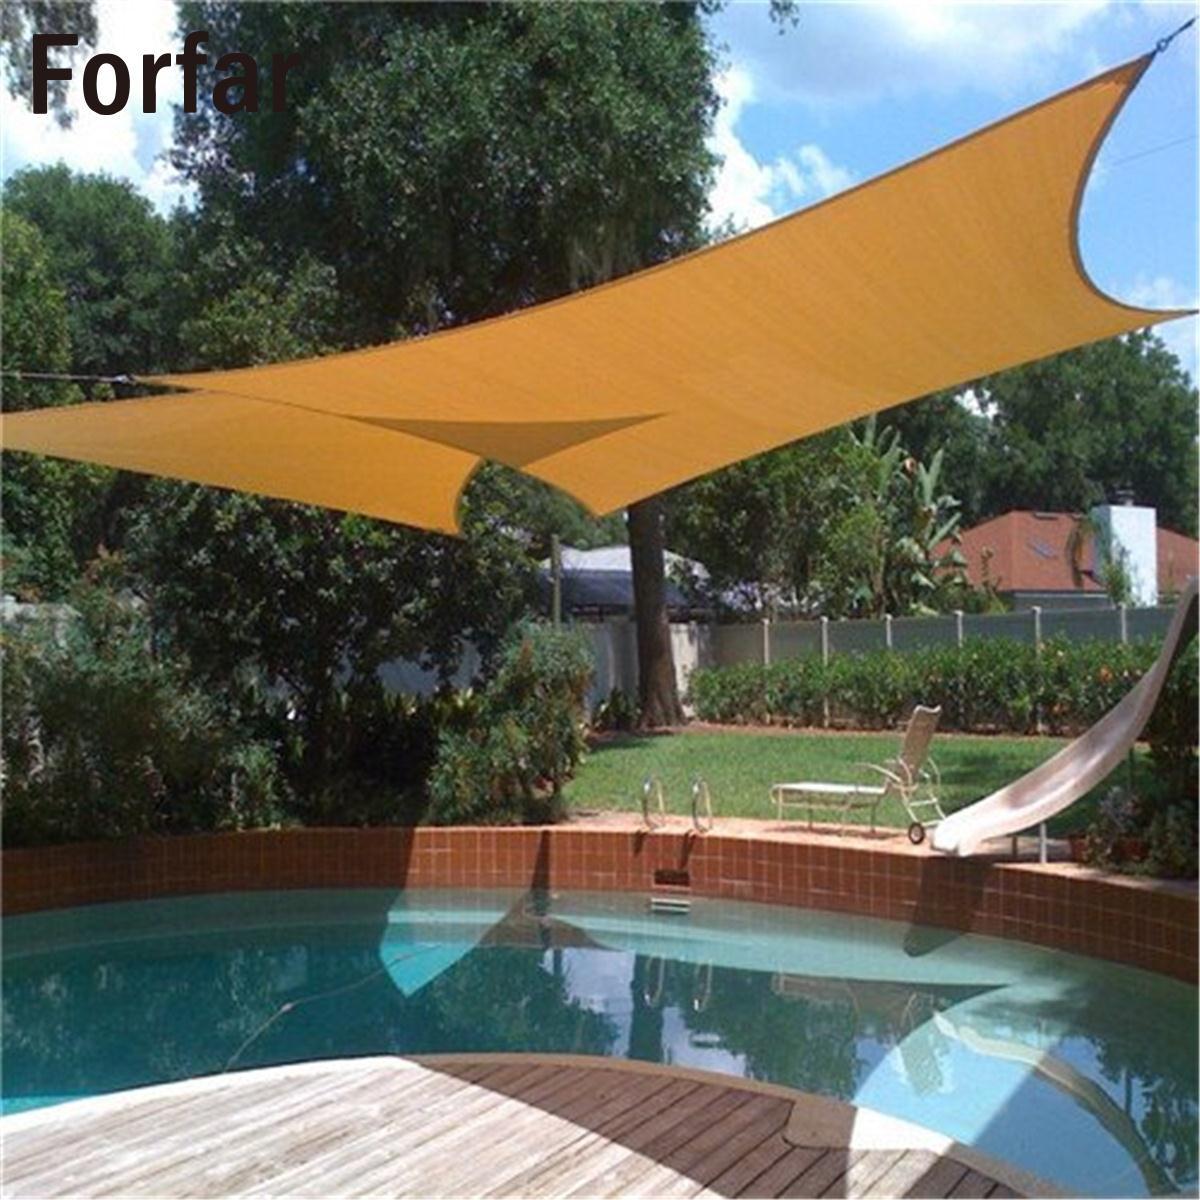 3x2M Waterproof Rectangle Sun Shade Sail Patio Sunscreen Awning Canopy Garden Screen UV Block Top Cover for Outdoor Sun Shelter